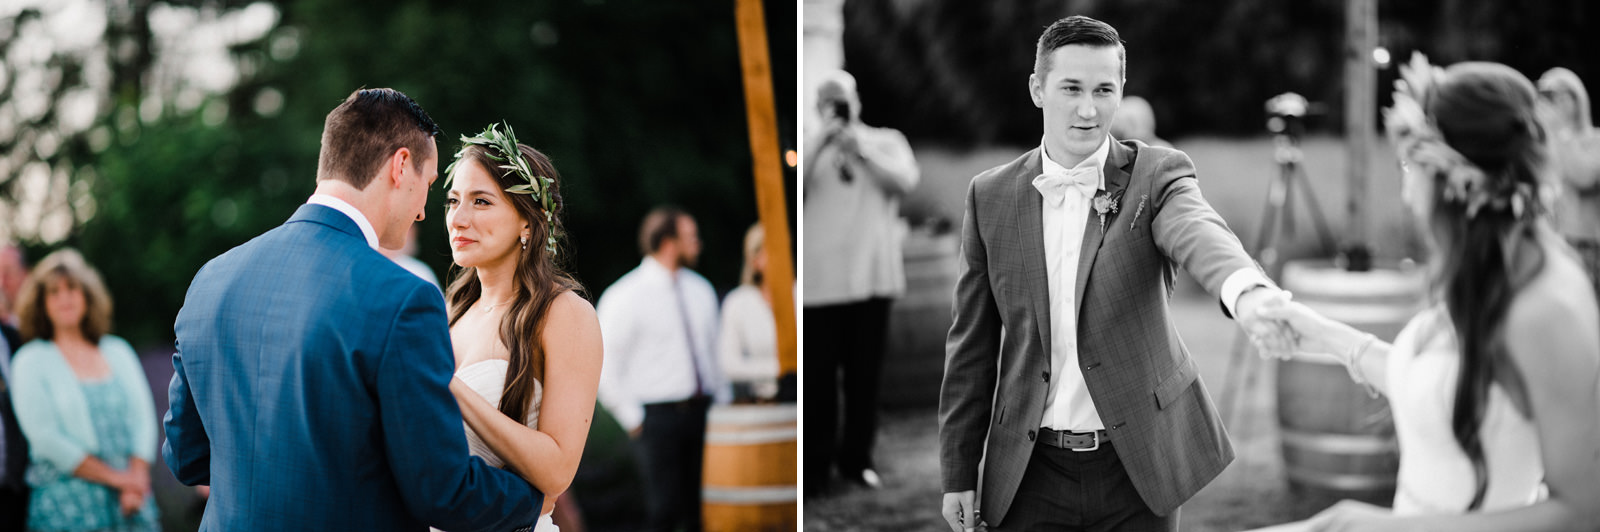 077-woodinville-lavendar-farm-wedding-with-golden-glowy-photos.jpg